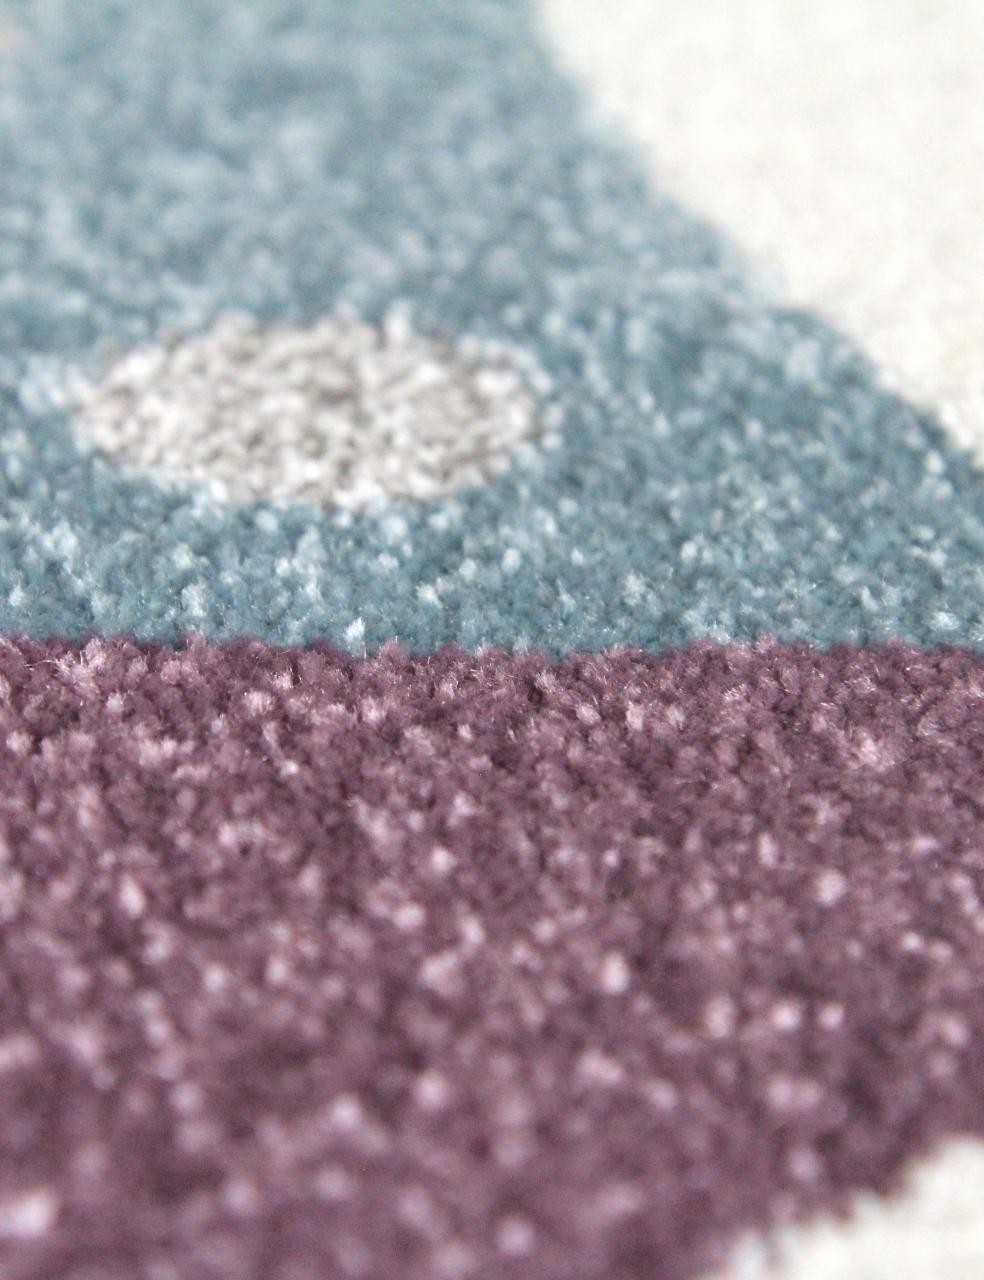 Ковер 2349 - LIGHT PURPLE - Прямоугольник - коллекция SOFIT - фото 4